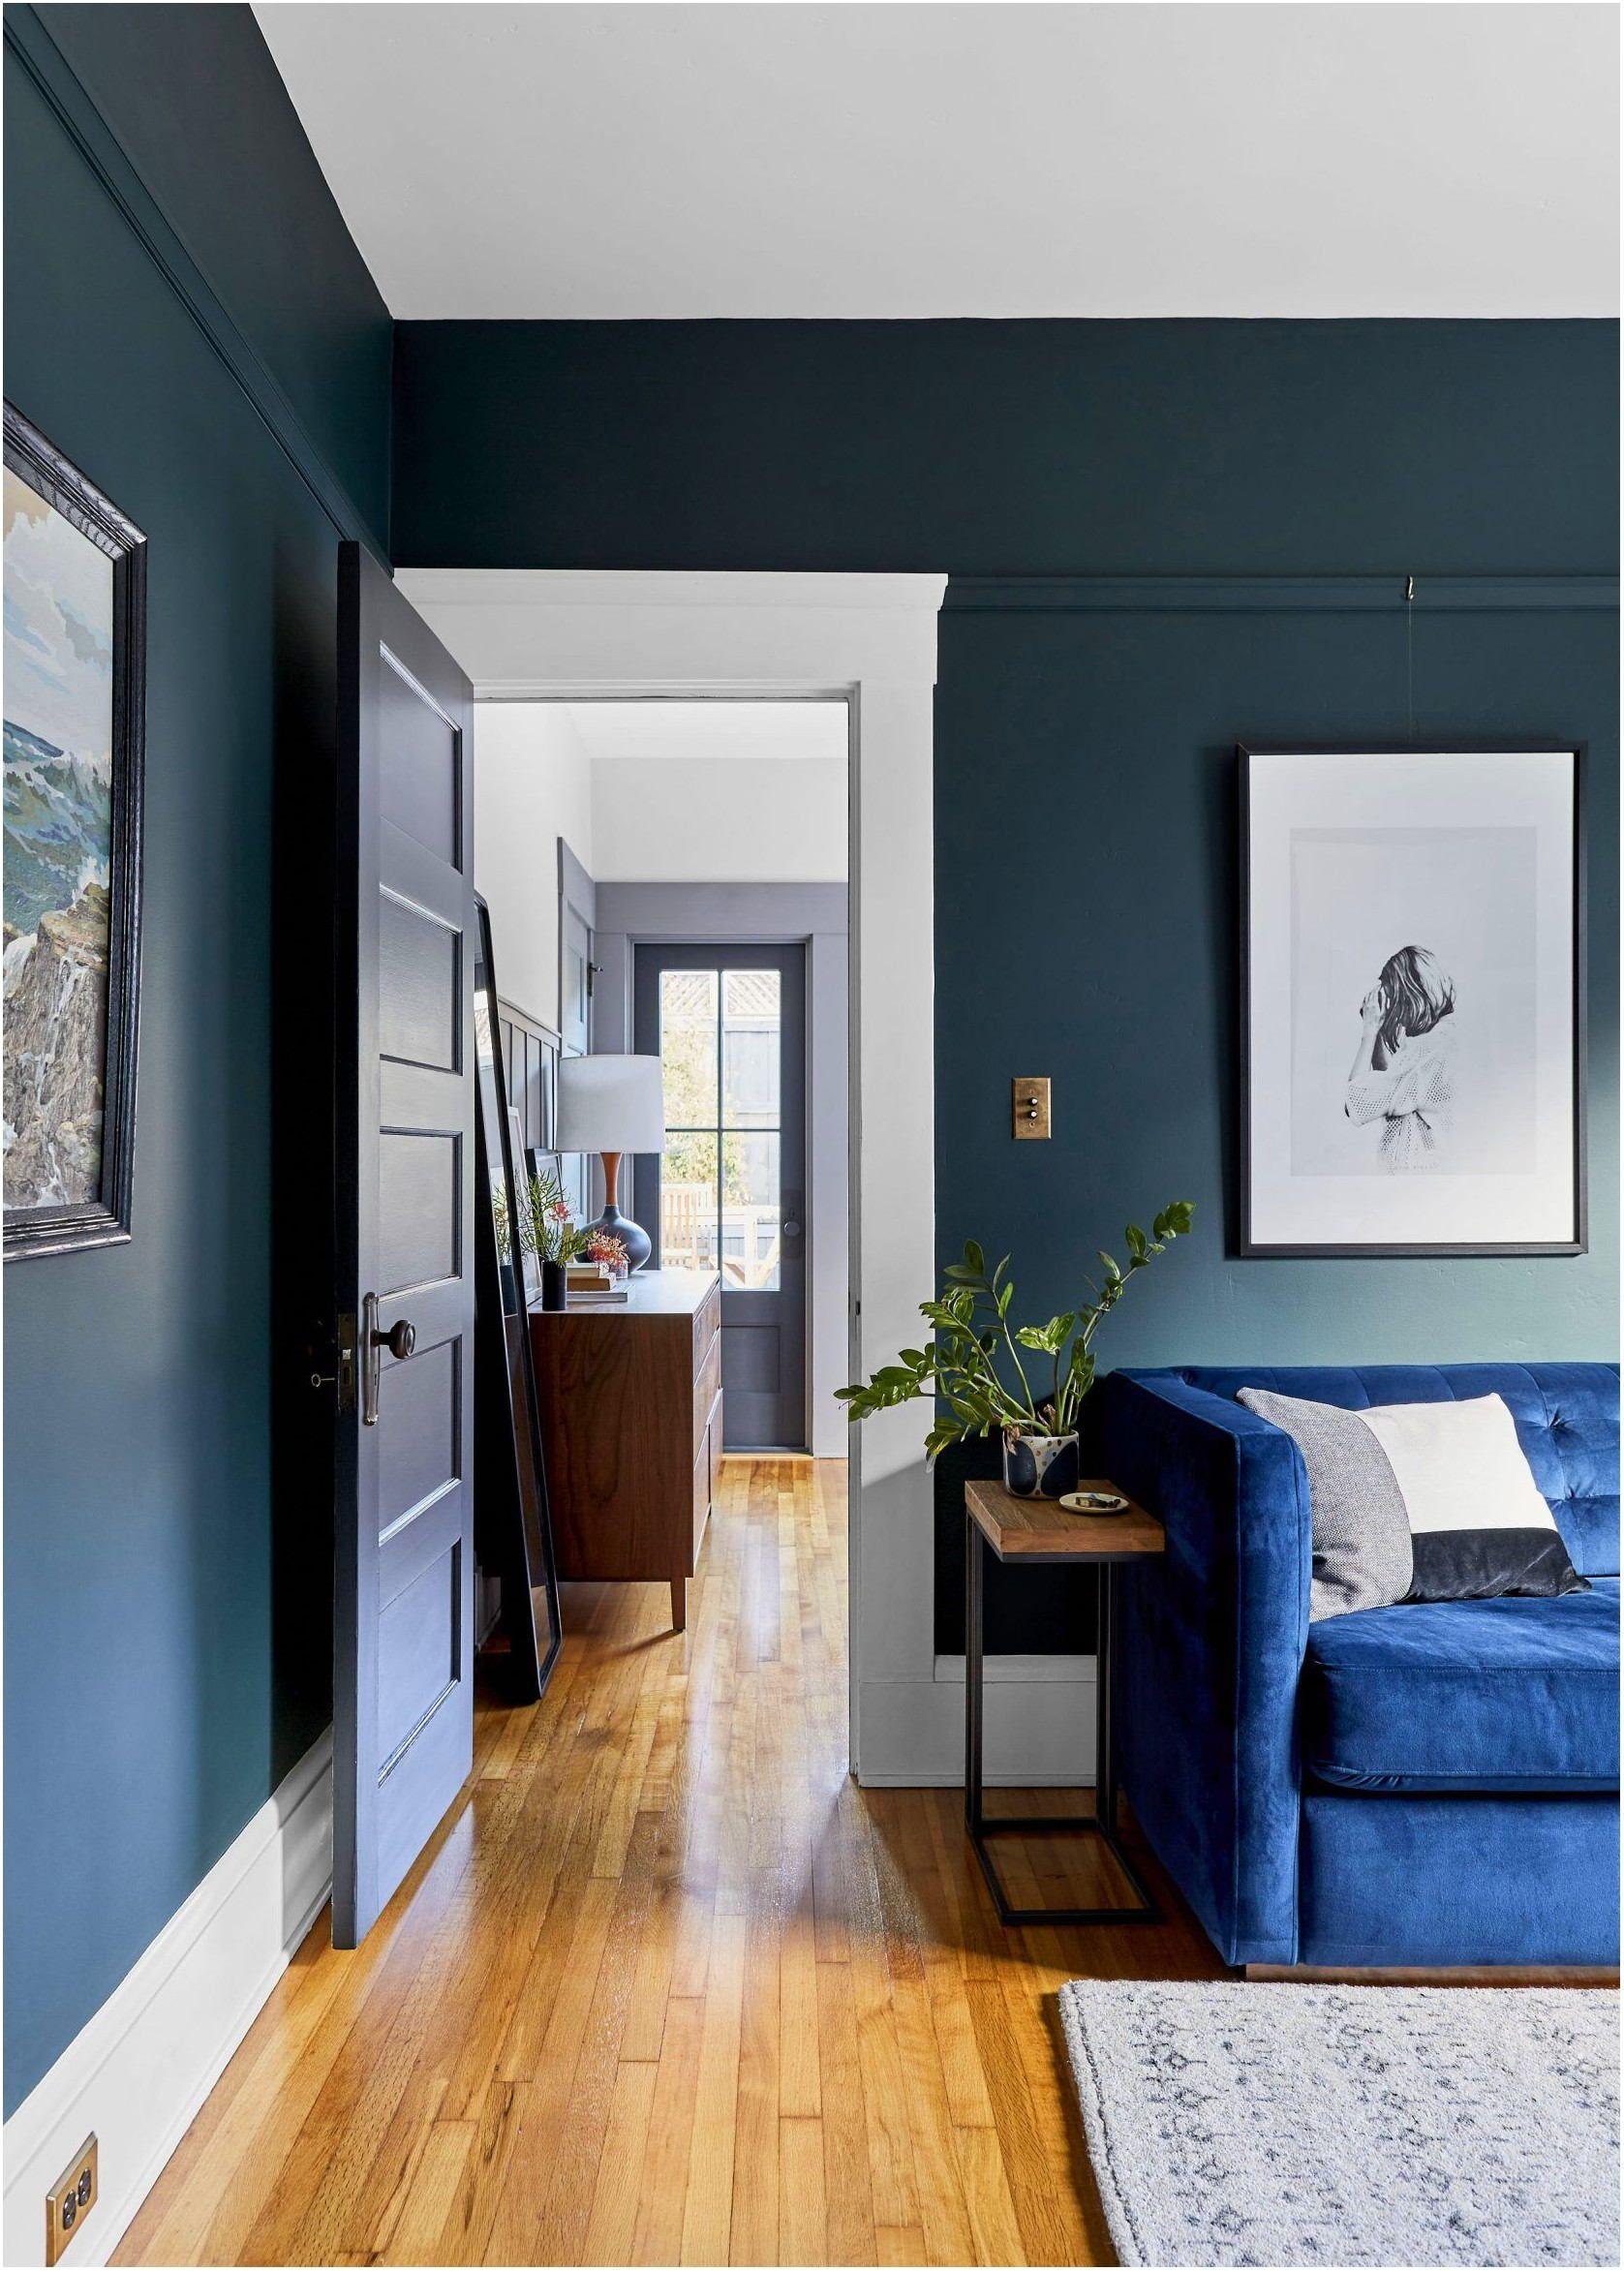 Interior Paint Living Room Ideas 2019 Paint Colors For Living Room Blue Living Room Living Room Paint